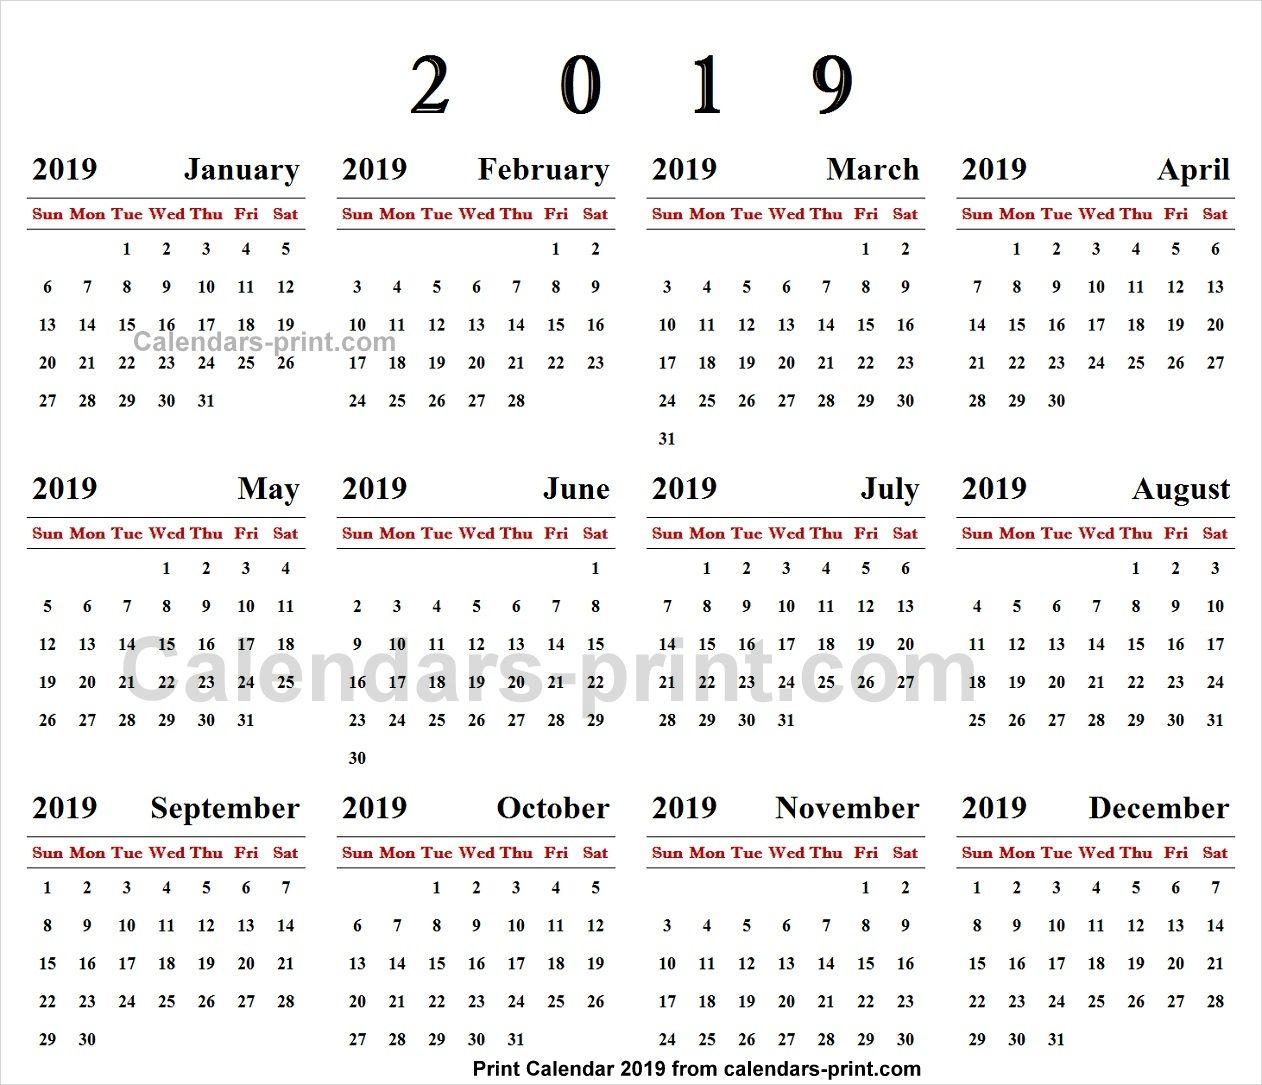 Print Online Calendar 2019 Online Calendar 2019 | 2019 Yearly Calendar | Online calendar